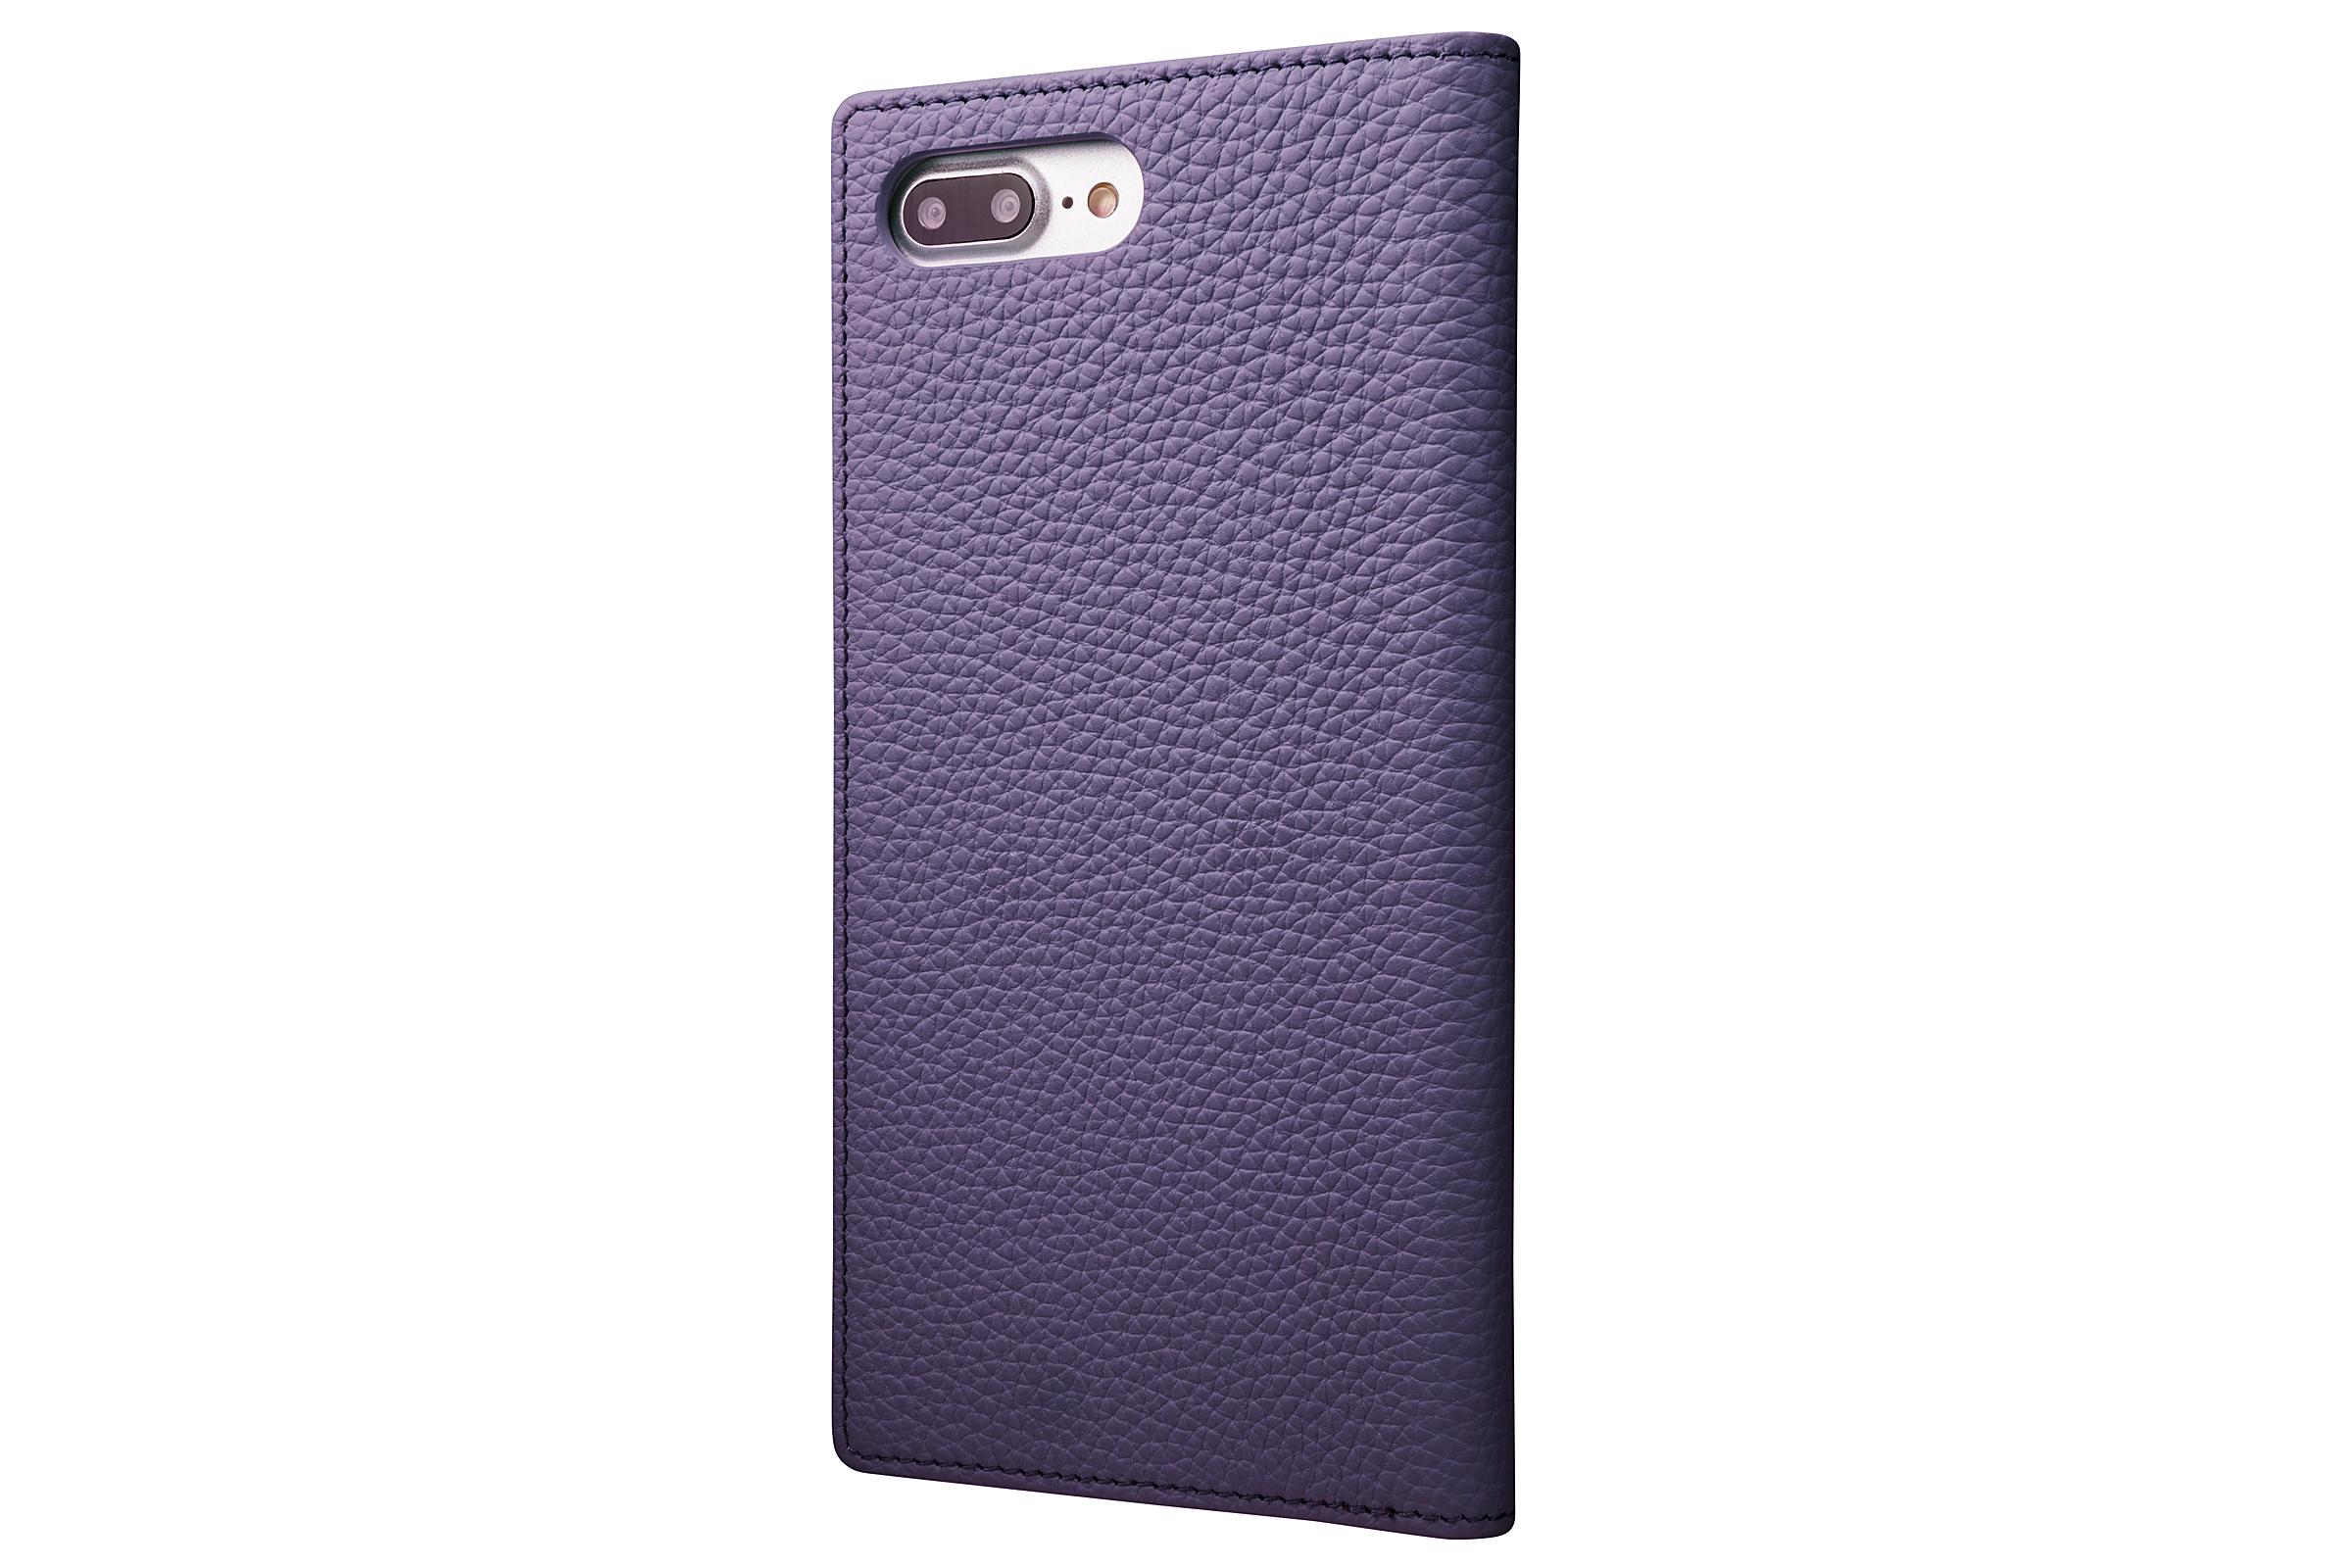 GRAMAS Shrunken-calf Full Leather Case for iPhone 7 Plus(Purple) シュランケンカーフ 手帳型フルレザーケース - 画像2